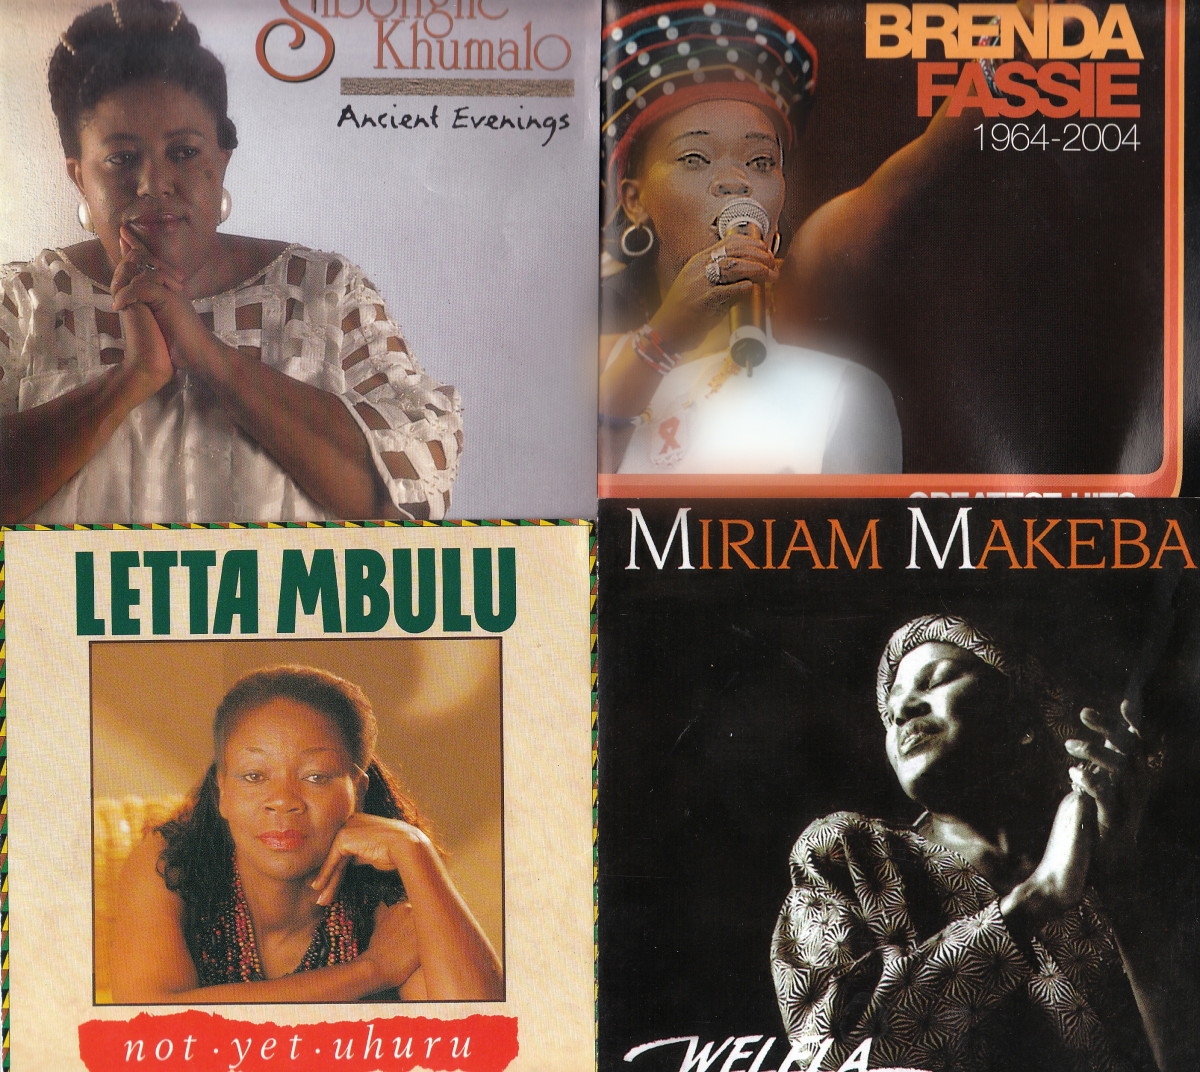 Sibongile Khumalo; Brenda Fassie; Letta Mbulu; Mirriam Makeba